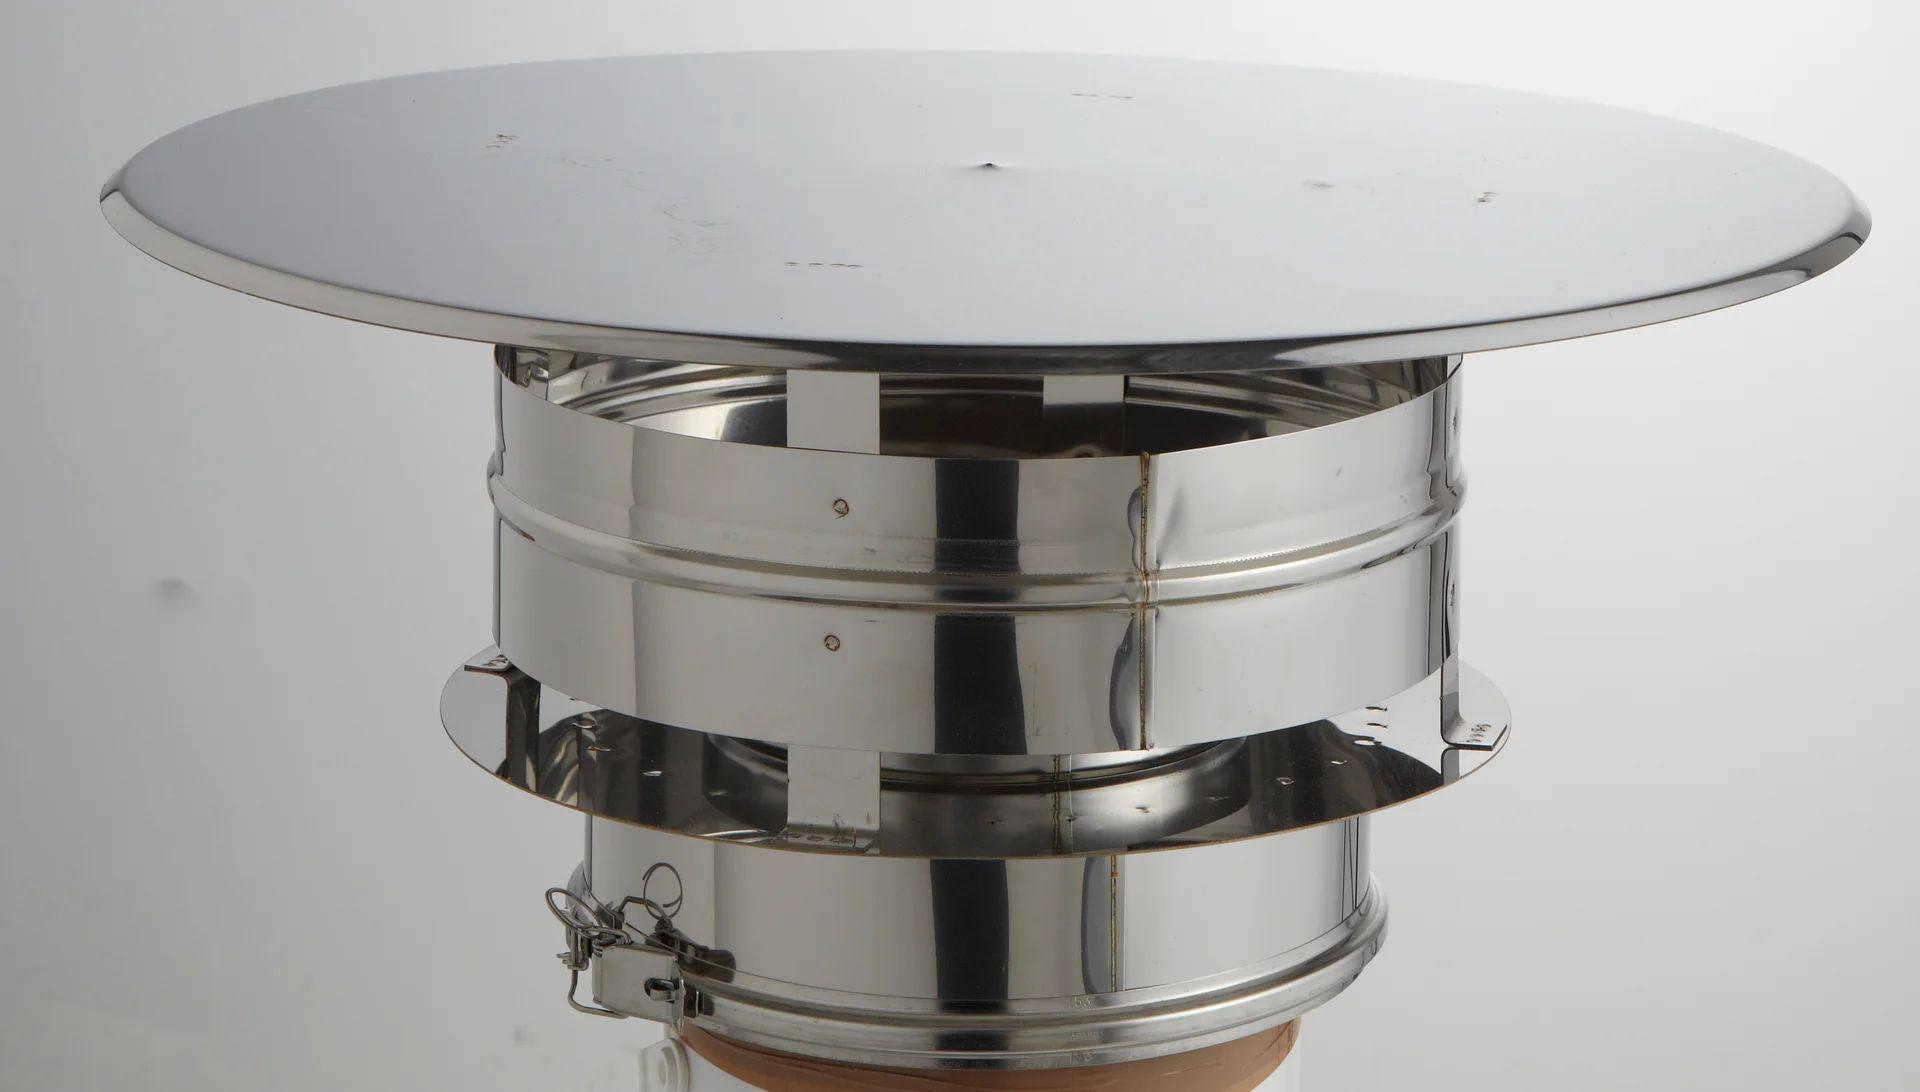 Chapeau Aspirateur Isotip Joncoux 230 Mm Leroy Merlin